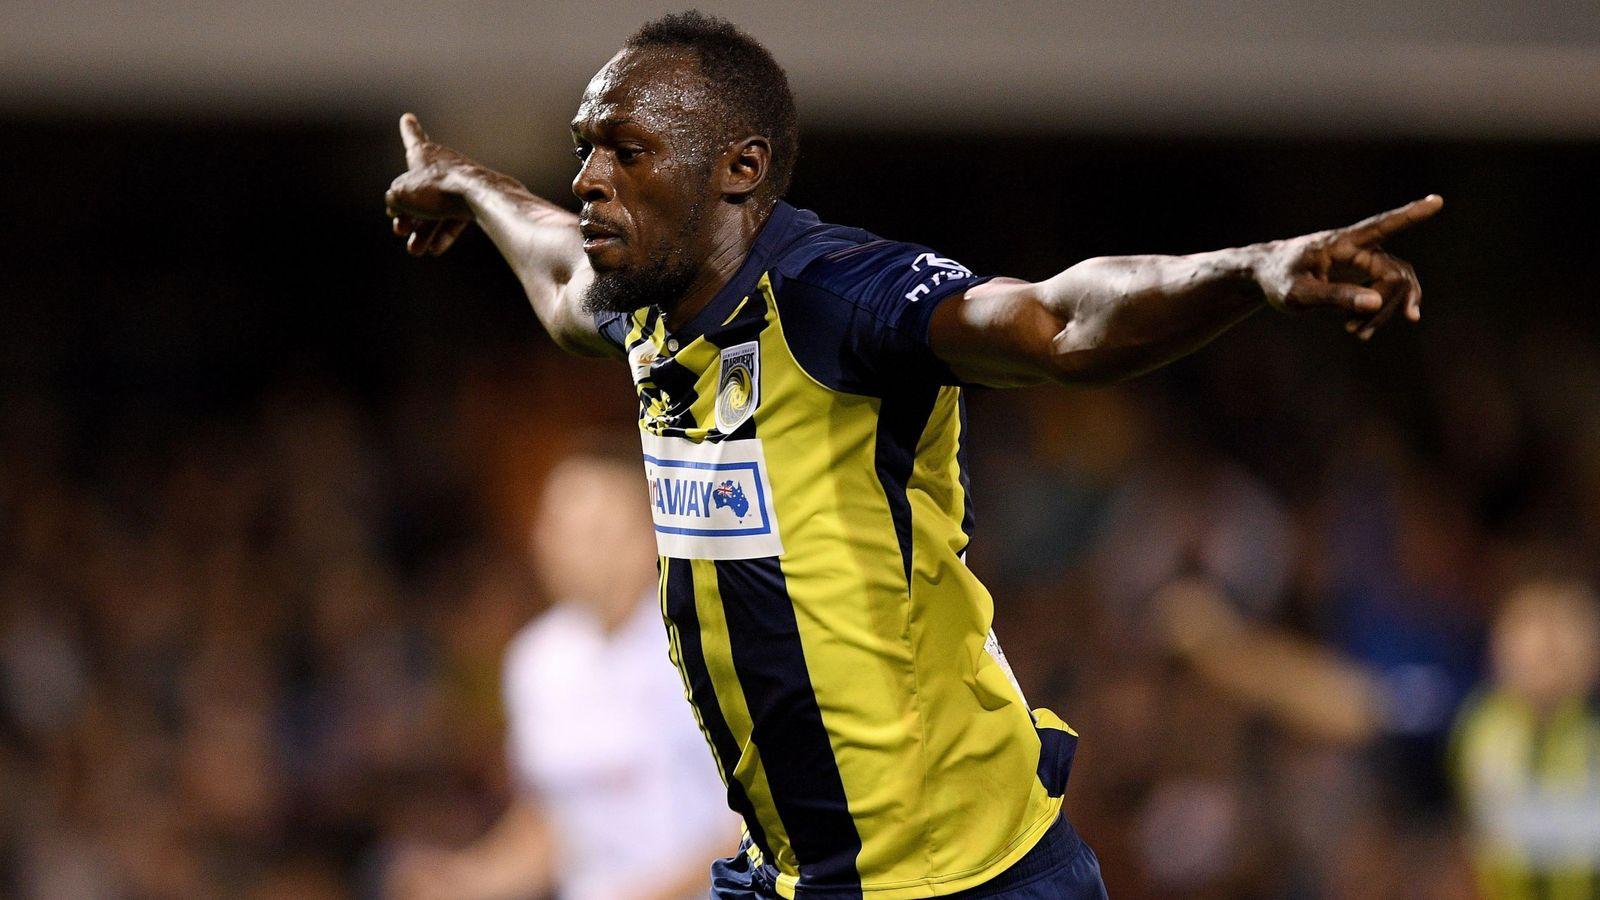 Usain Bolt, del tartán al césped: sus primeros goles como futbolista profesional